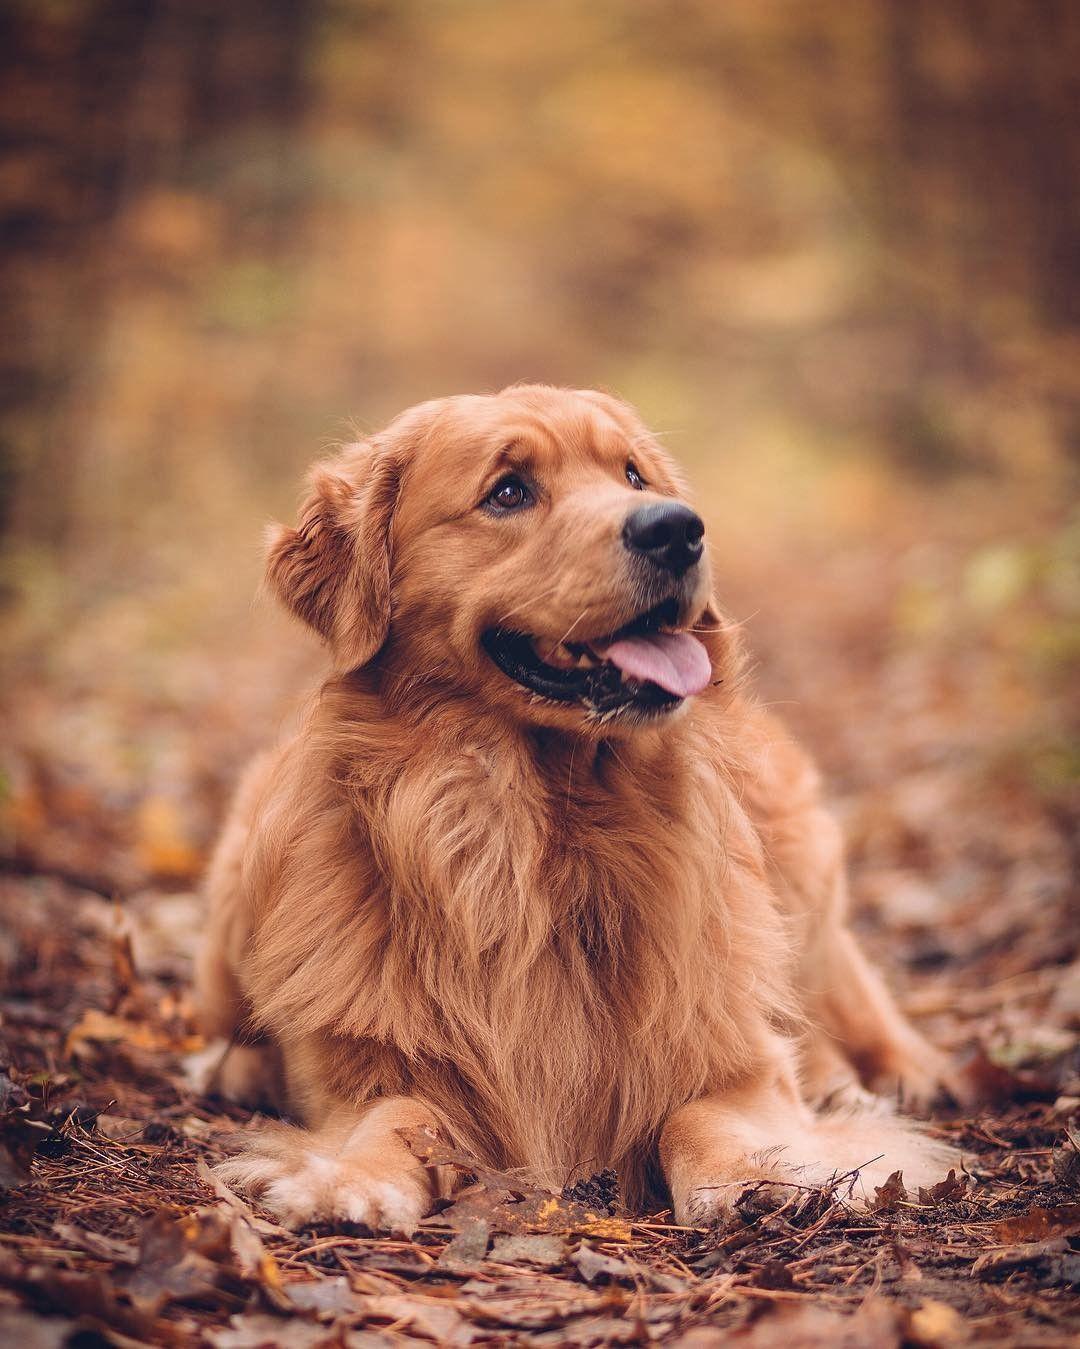 Golden Retriever Dogs Cute Dogs Cute Puppies